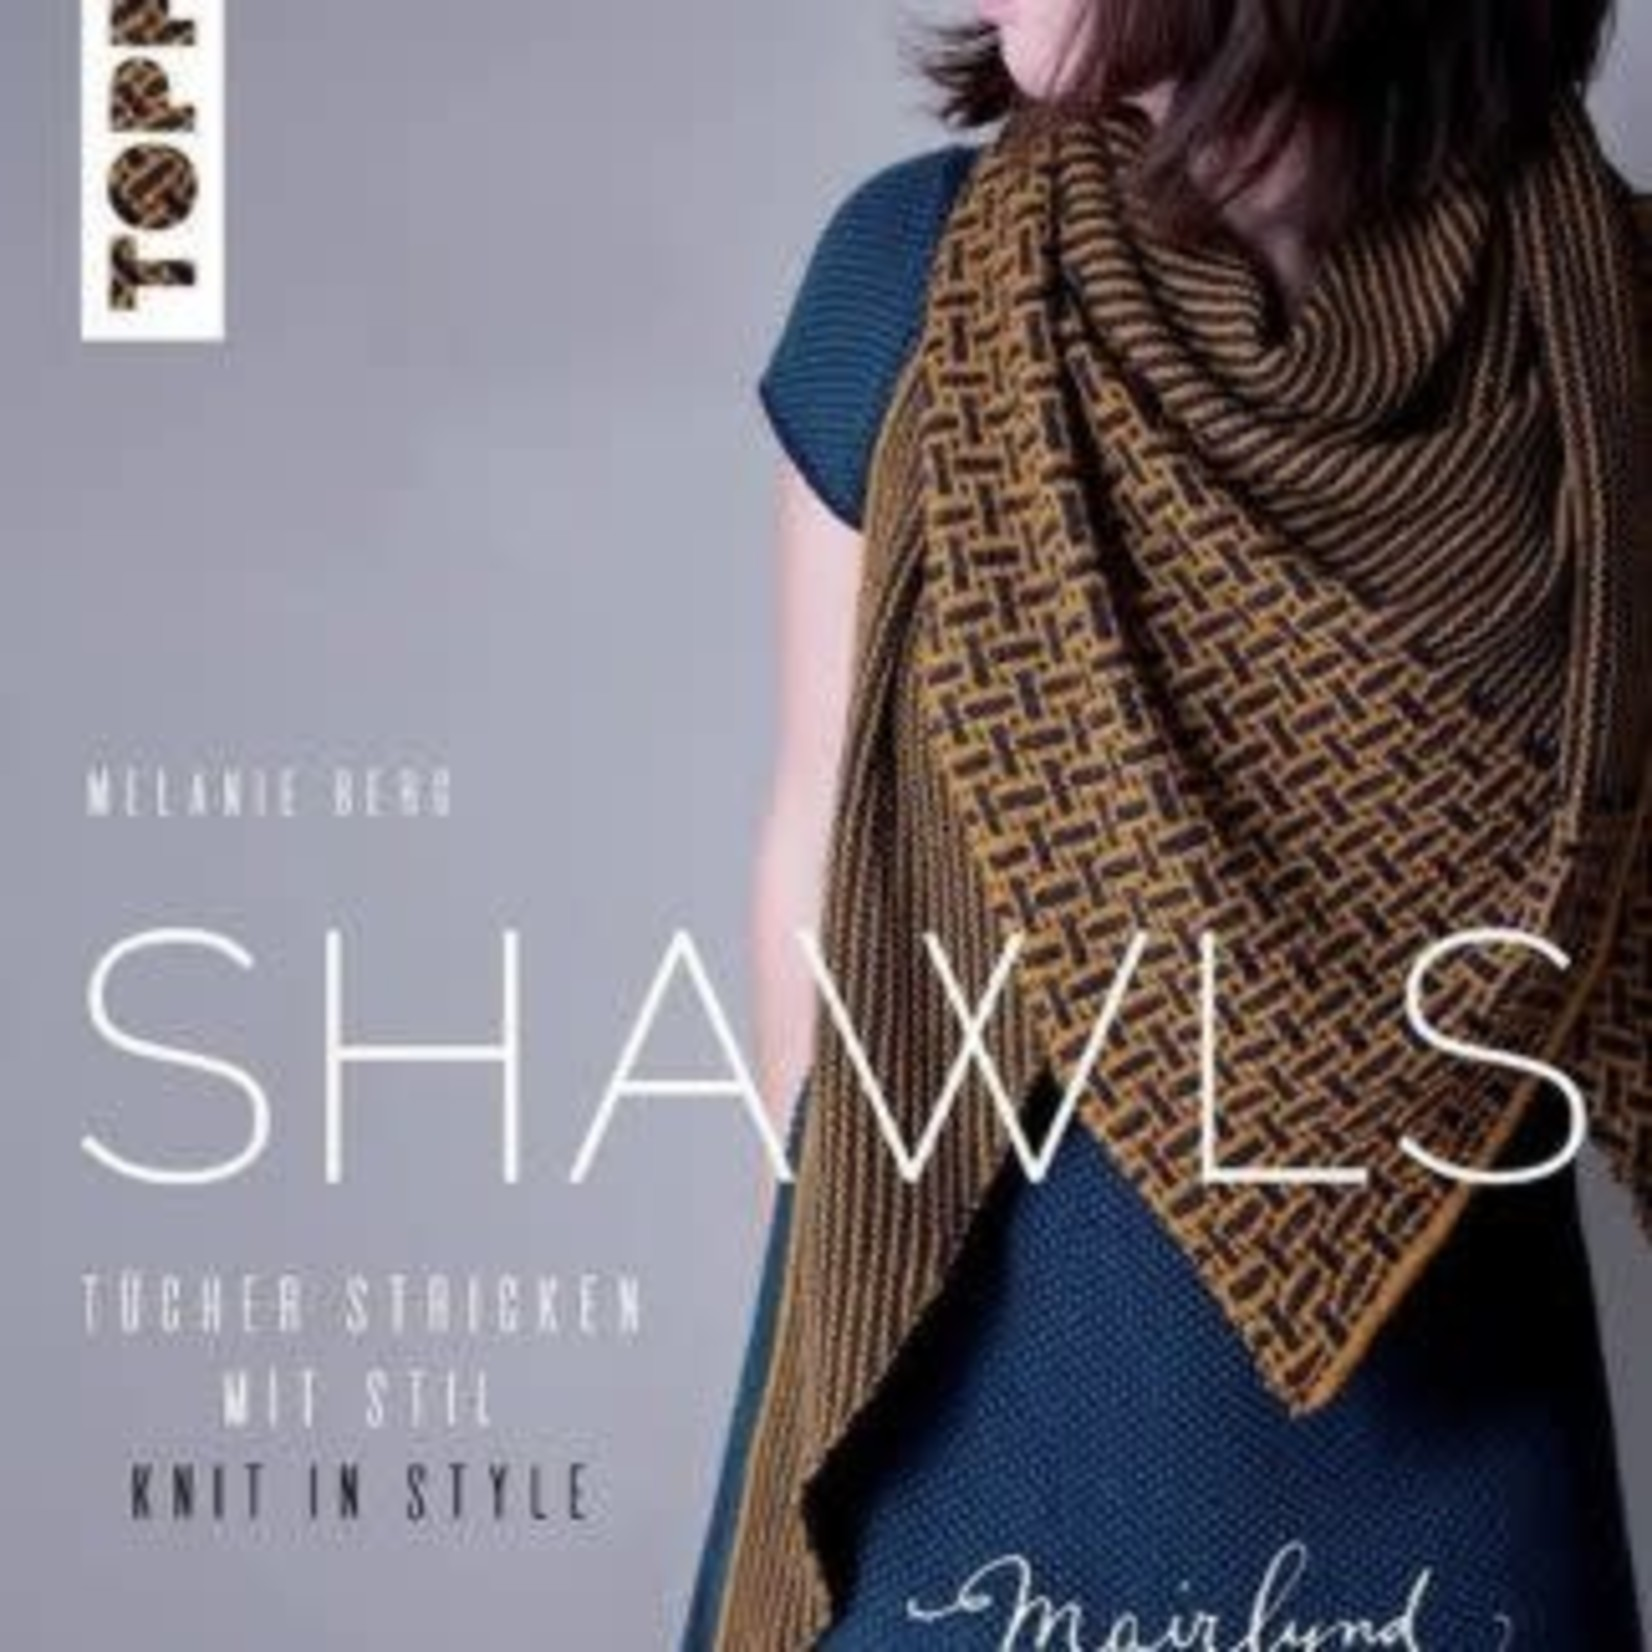 Julie Asselin Shawls by Melanie Berg